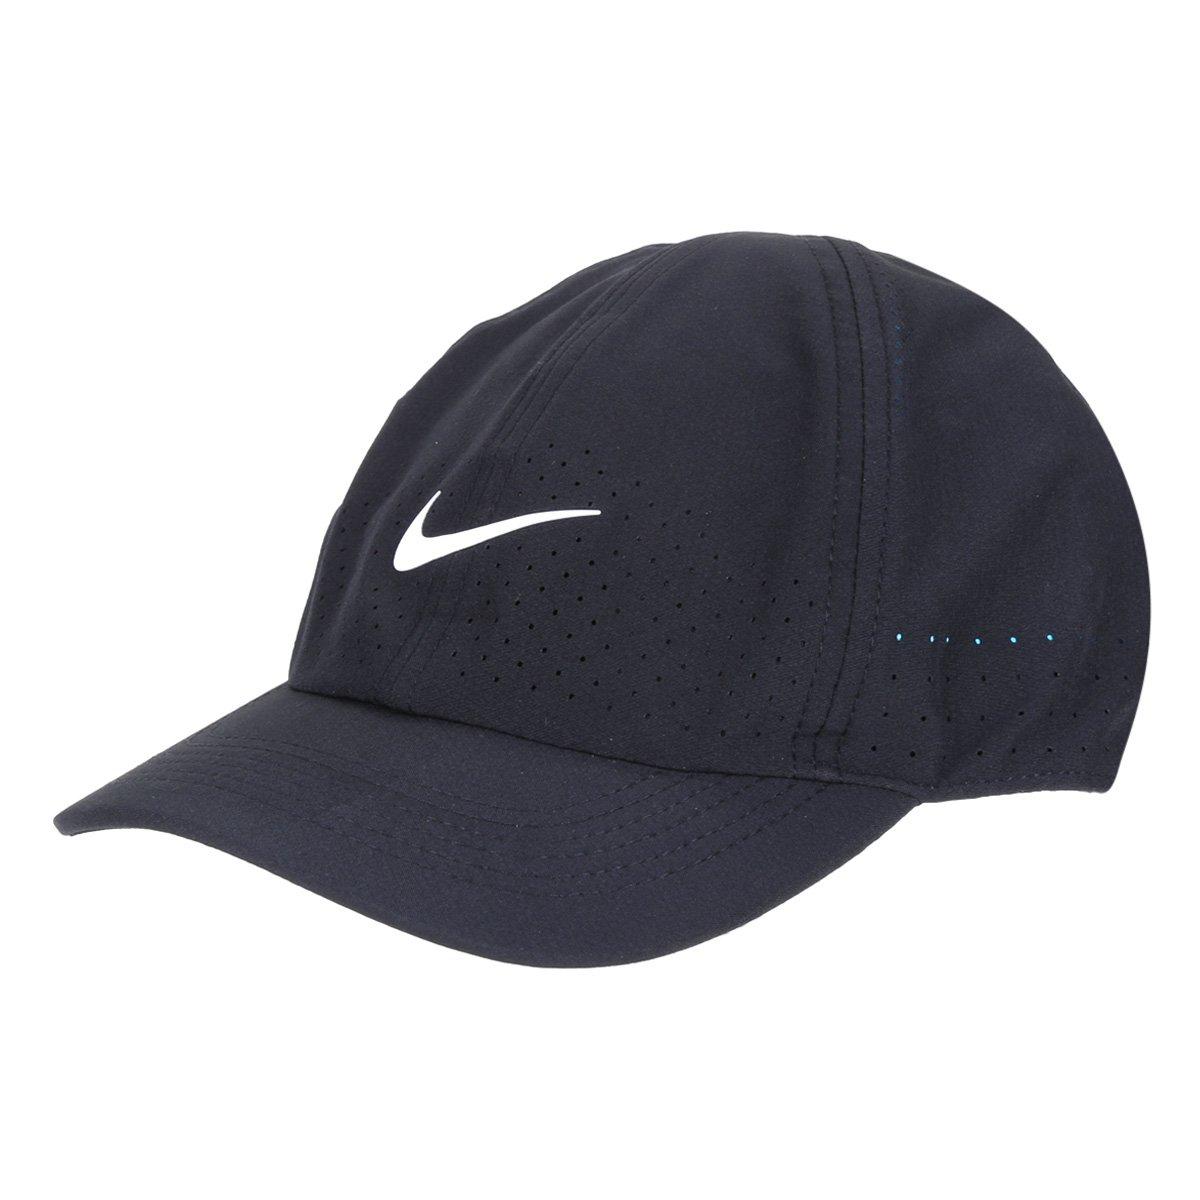 Boné Nike Court Aba Curva Strapback Aerobill Advantage